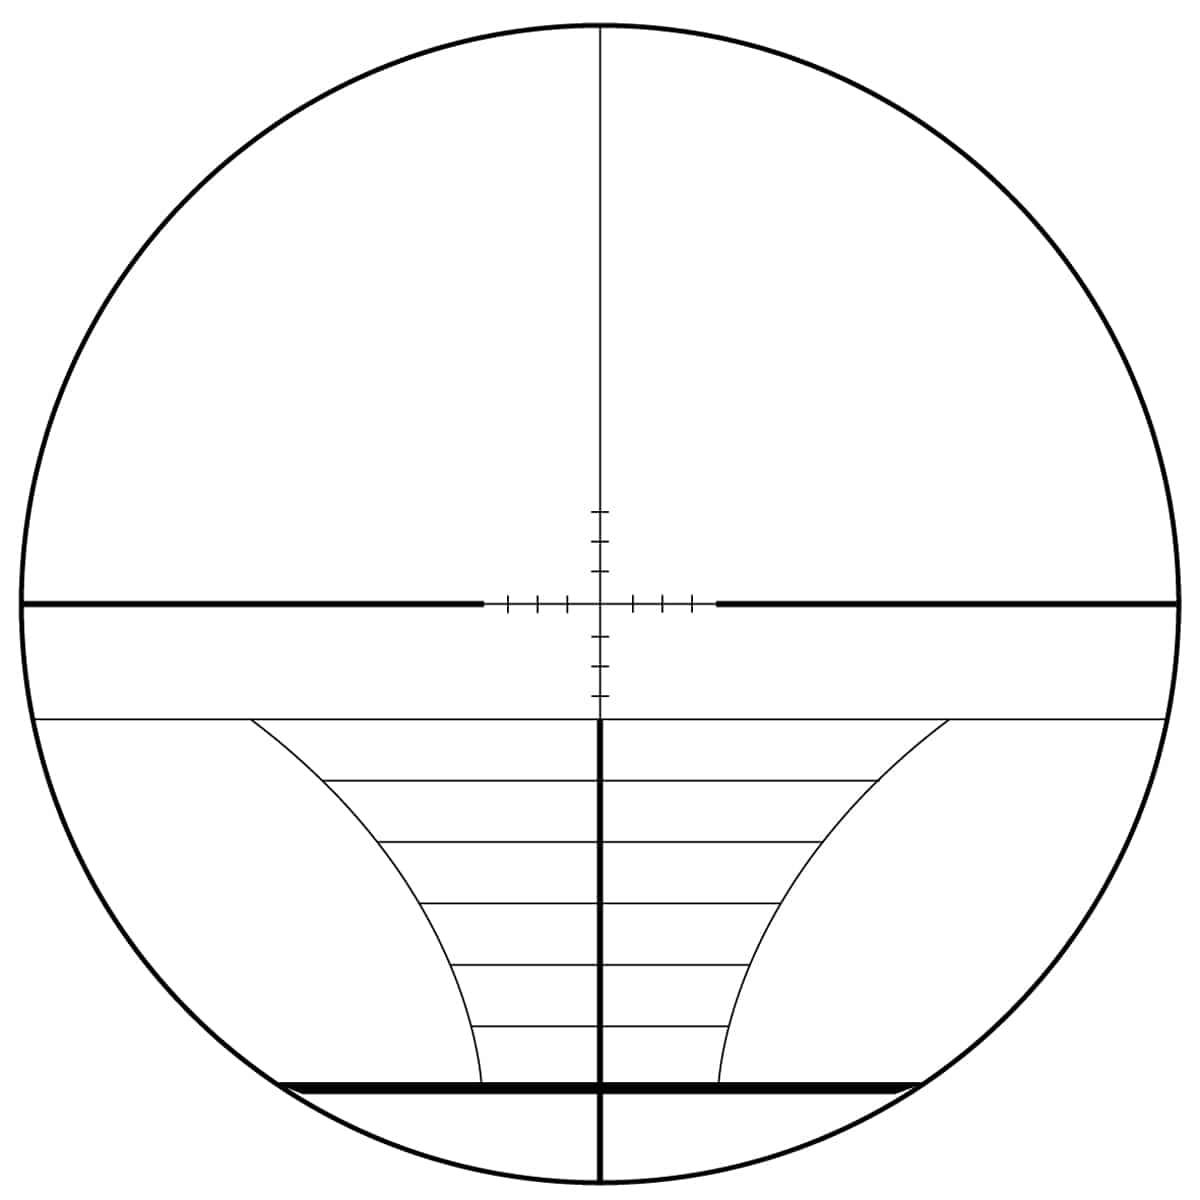 SL 10-40x50AOE Acom reticle